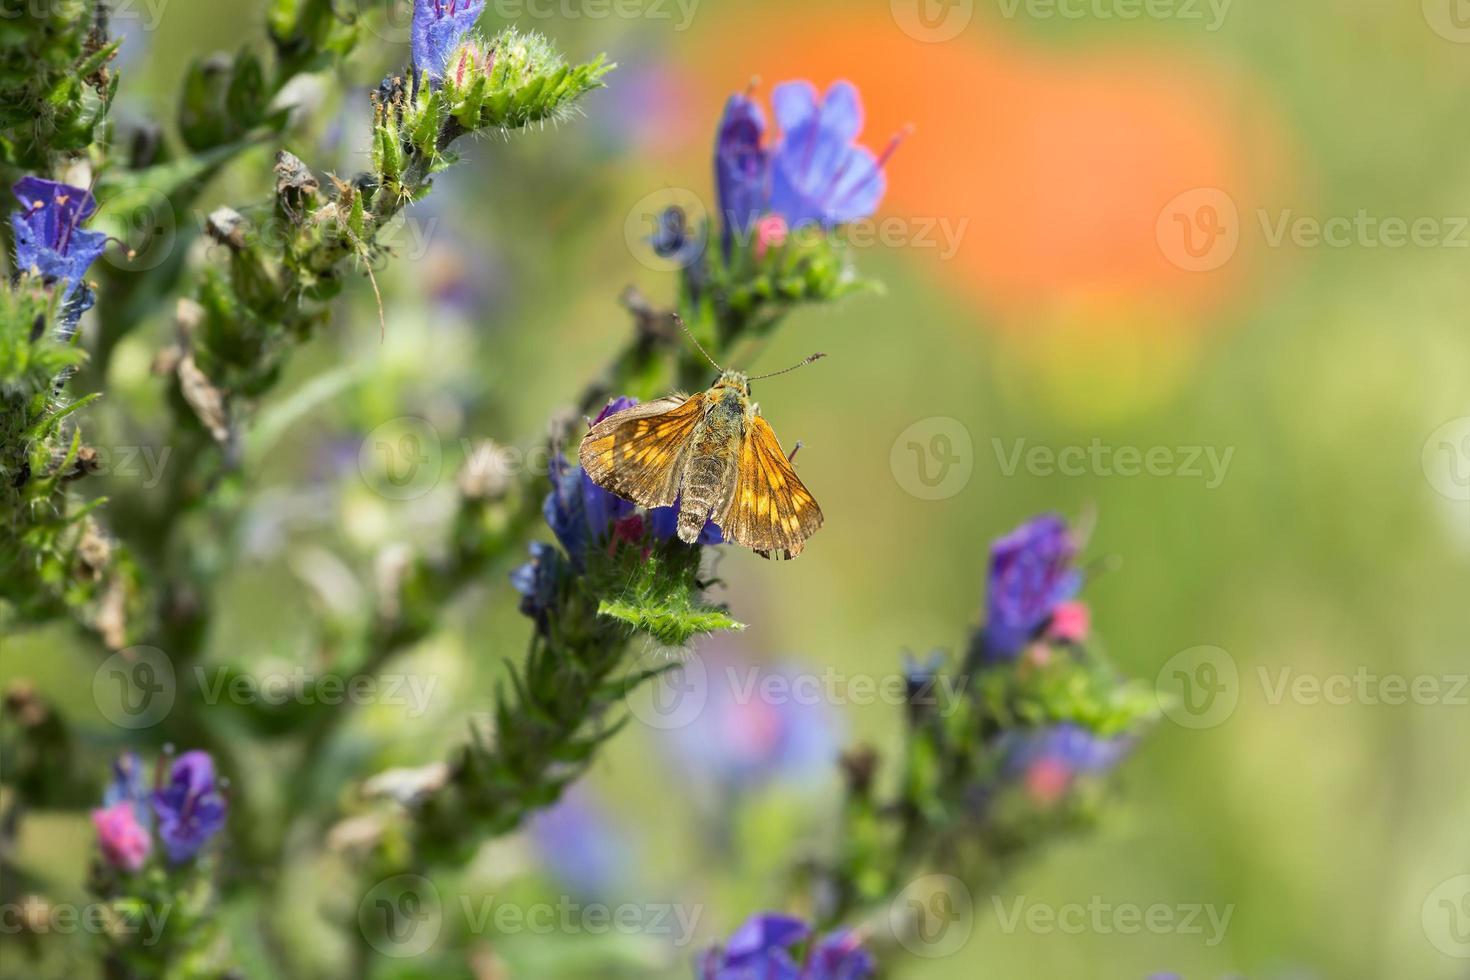 schipper vlinder, hesperiidae op blauwkruid foto